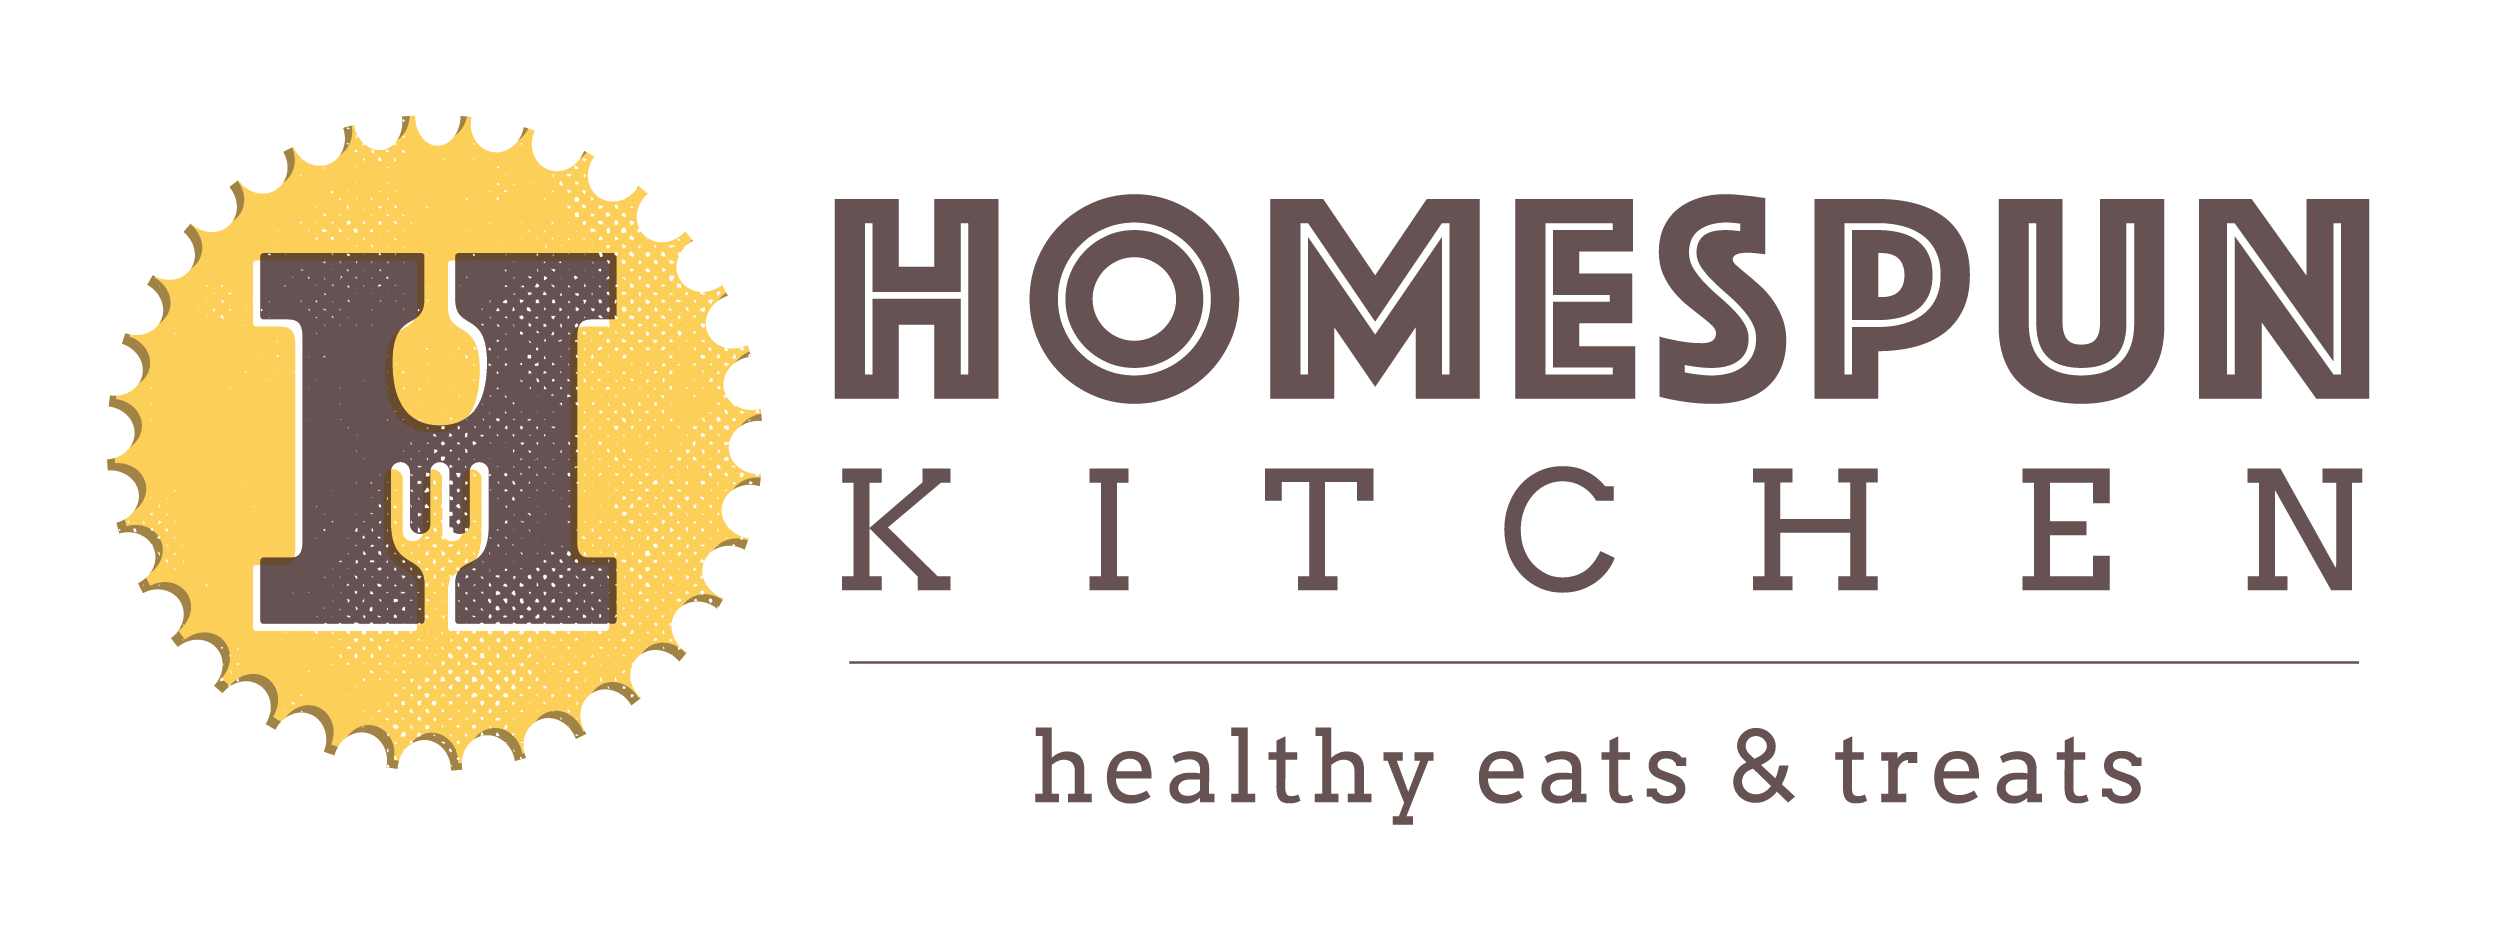 Homespun Kitchen